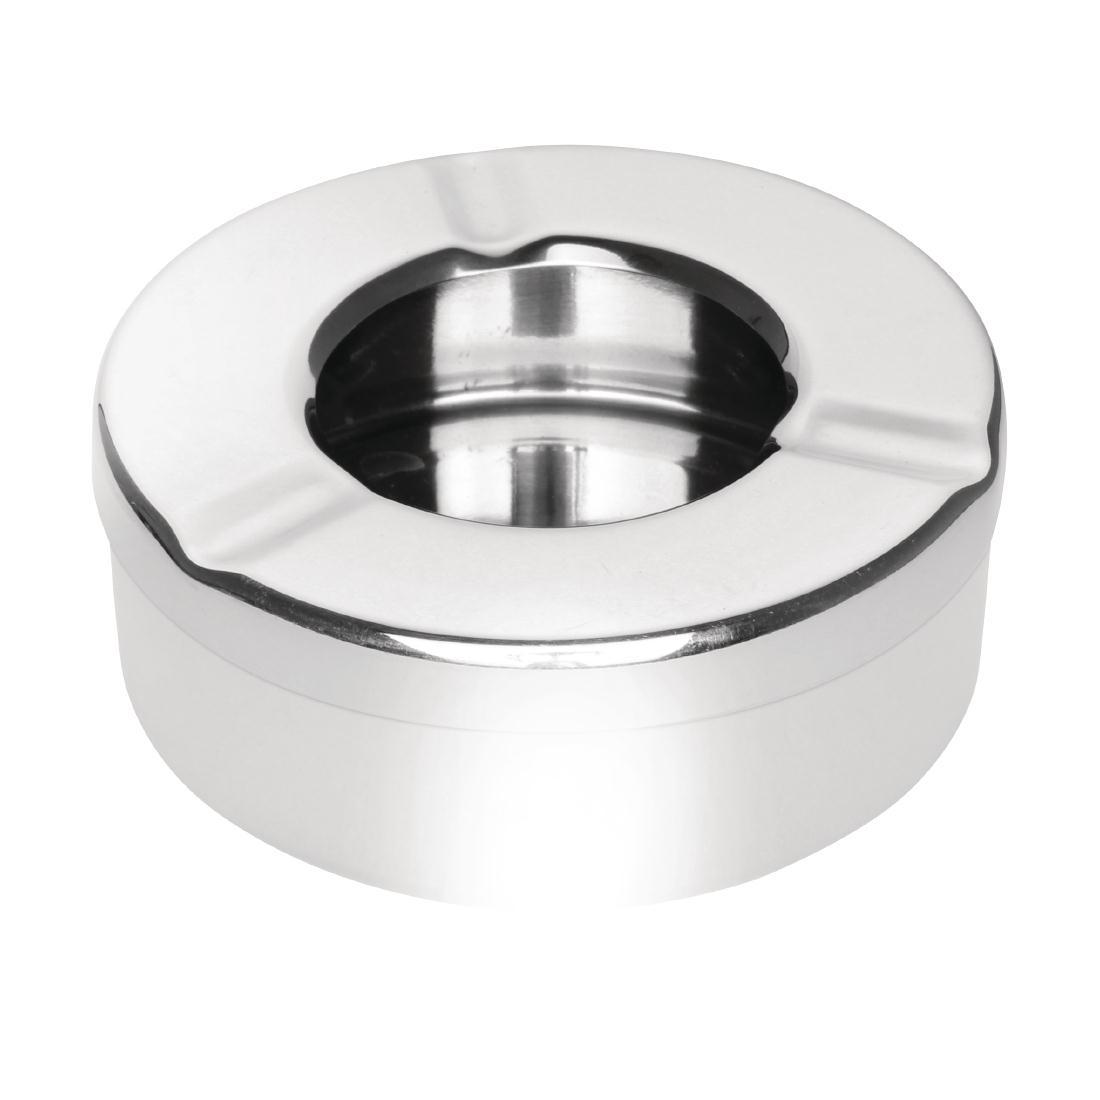 Cendrier inox anti-vent  90mm